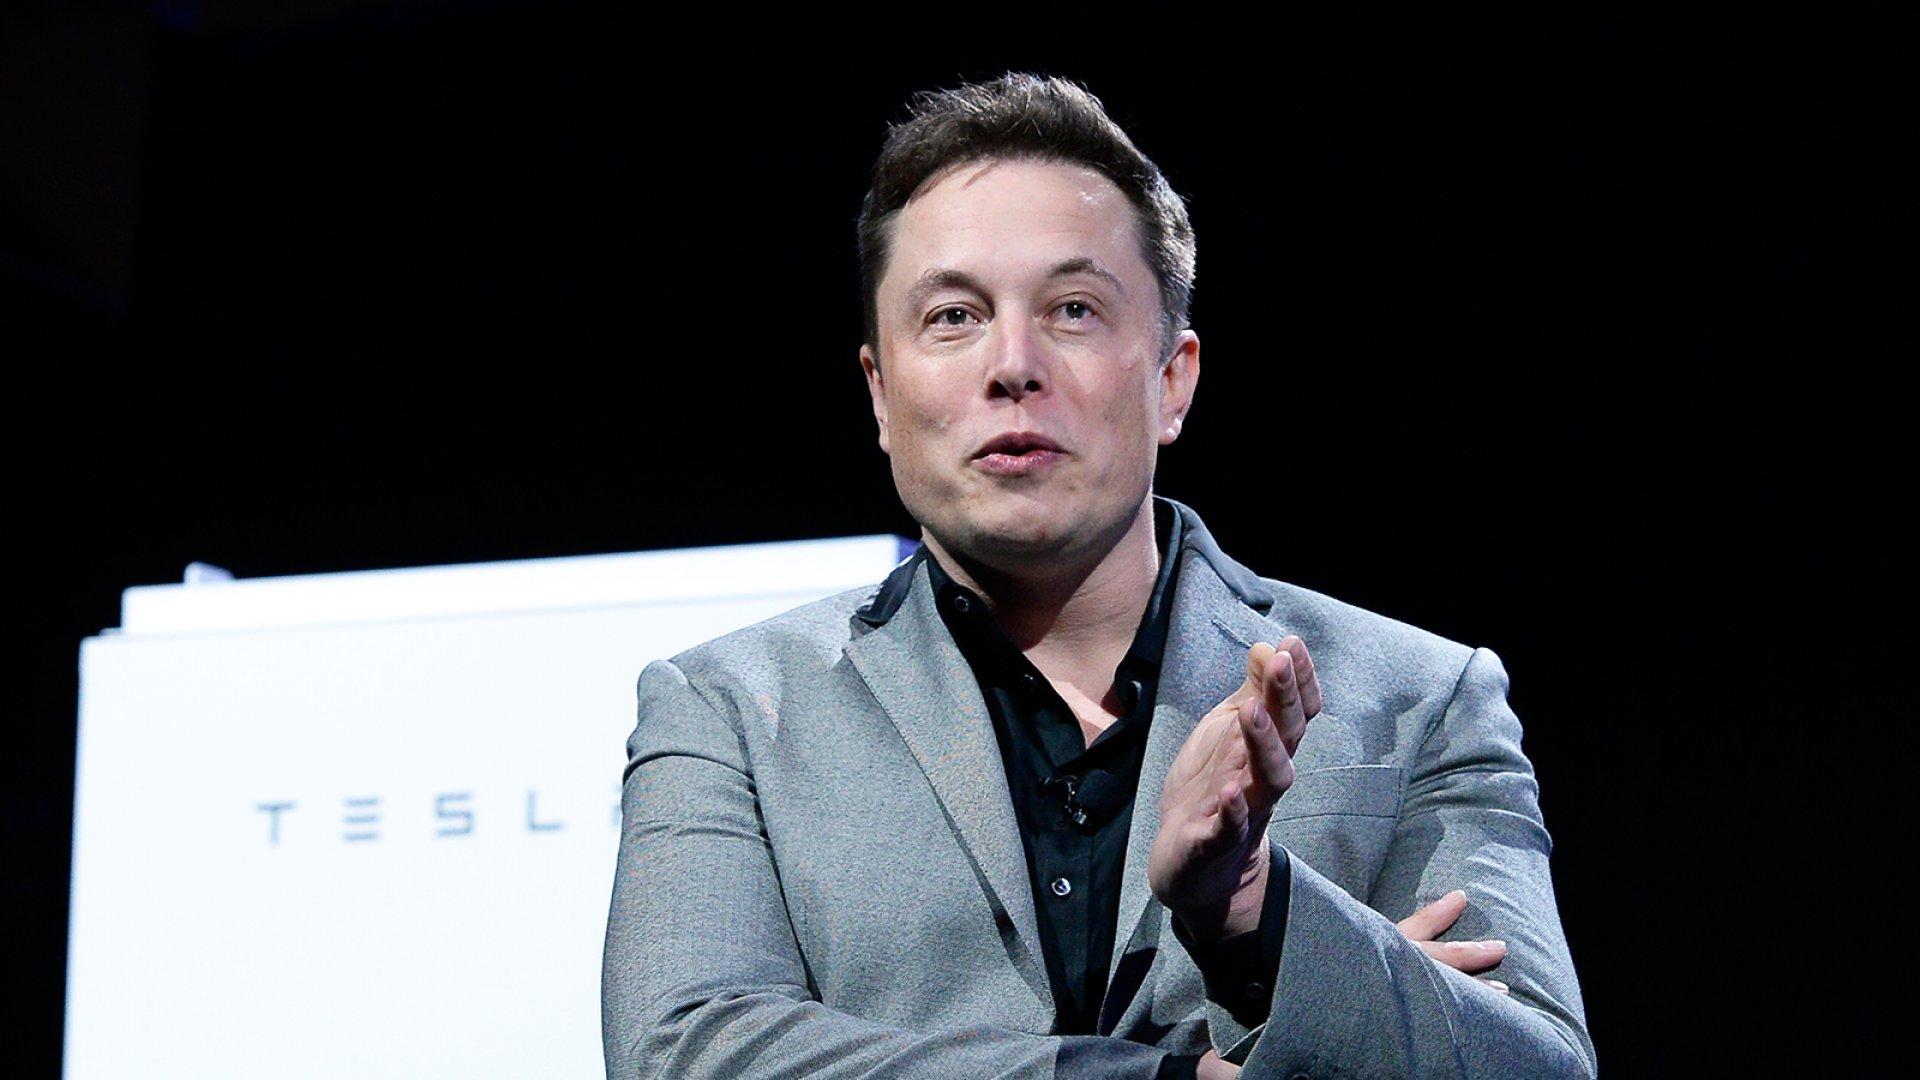 Elon Musk's unveiling Tesla's Powerwall and Powerpack batteries in April 2015.